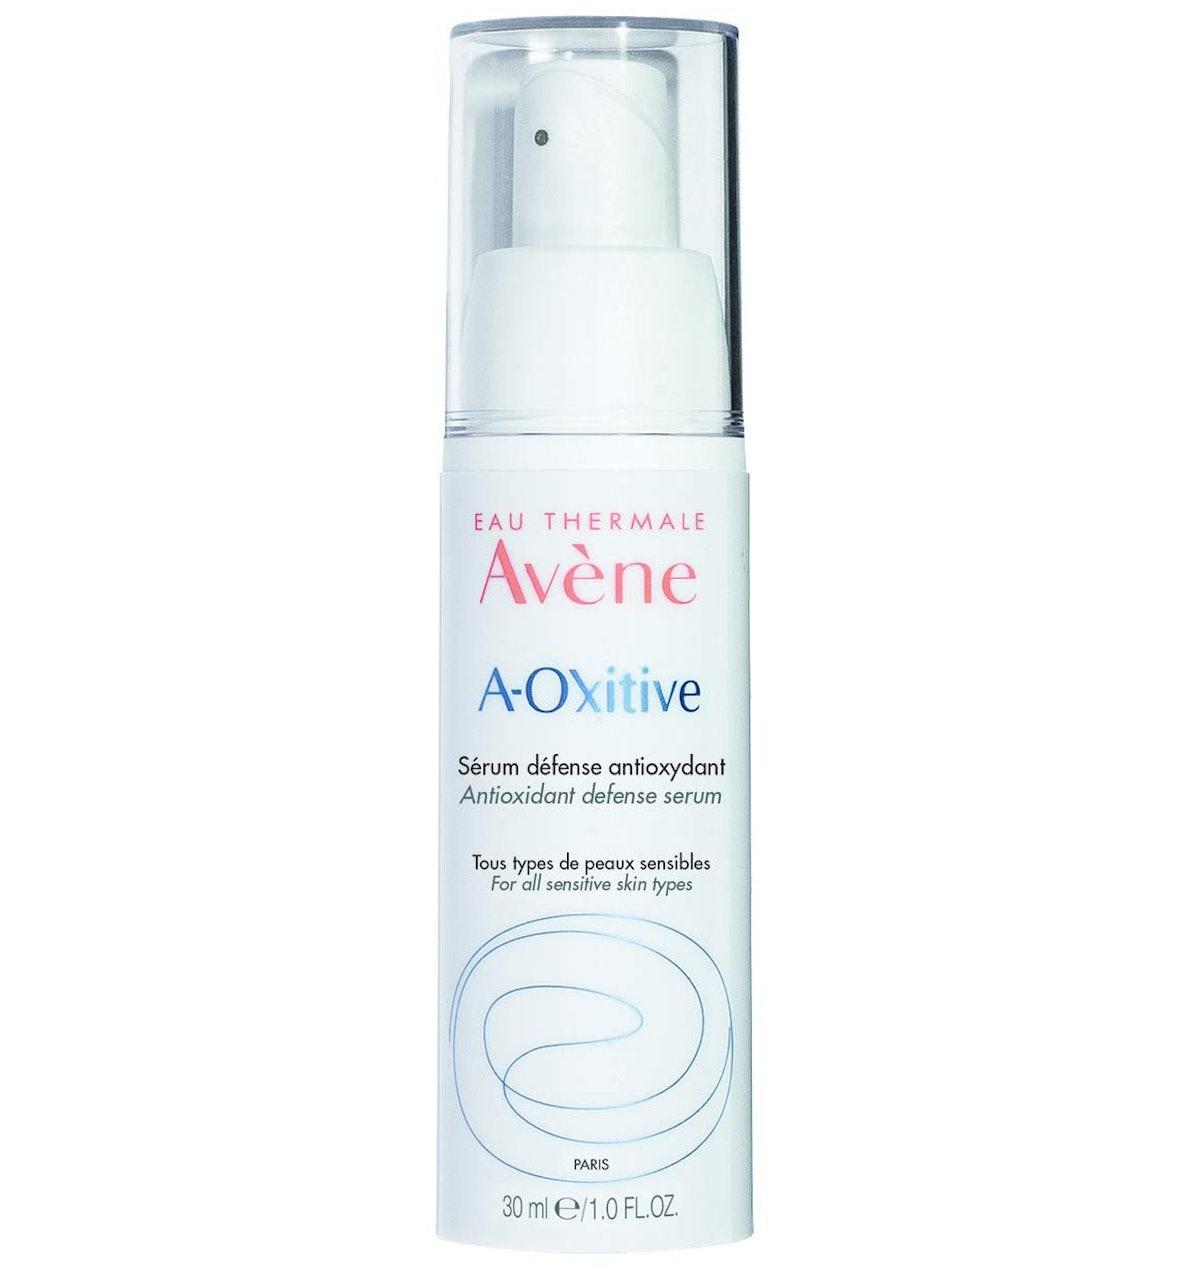 Eau Thermale Avene A-Oxitive Antioxidant Defense Serum